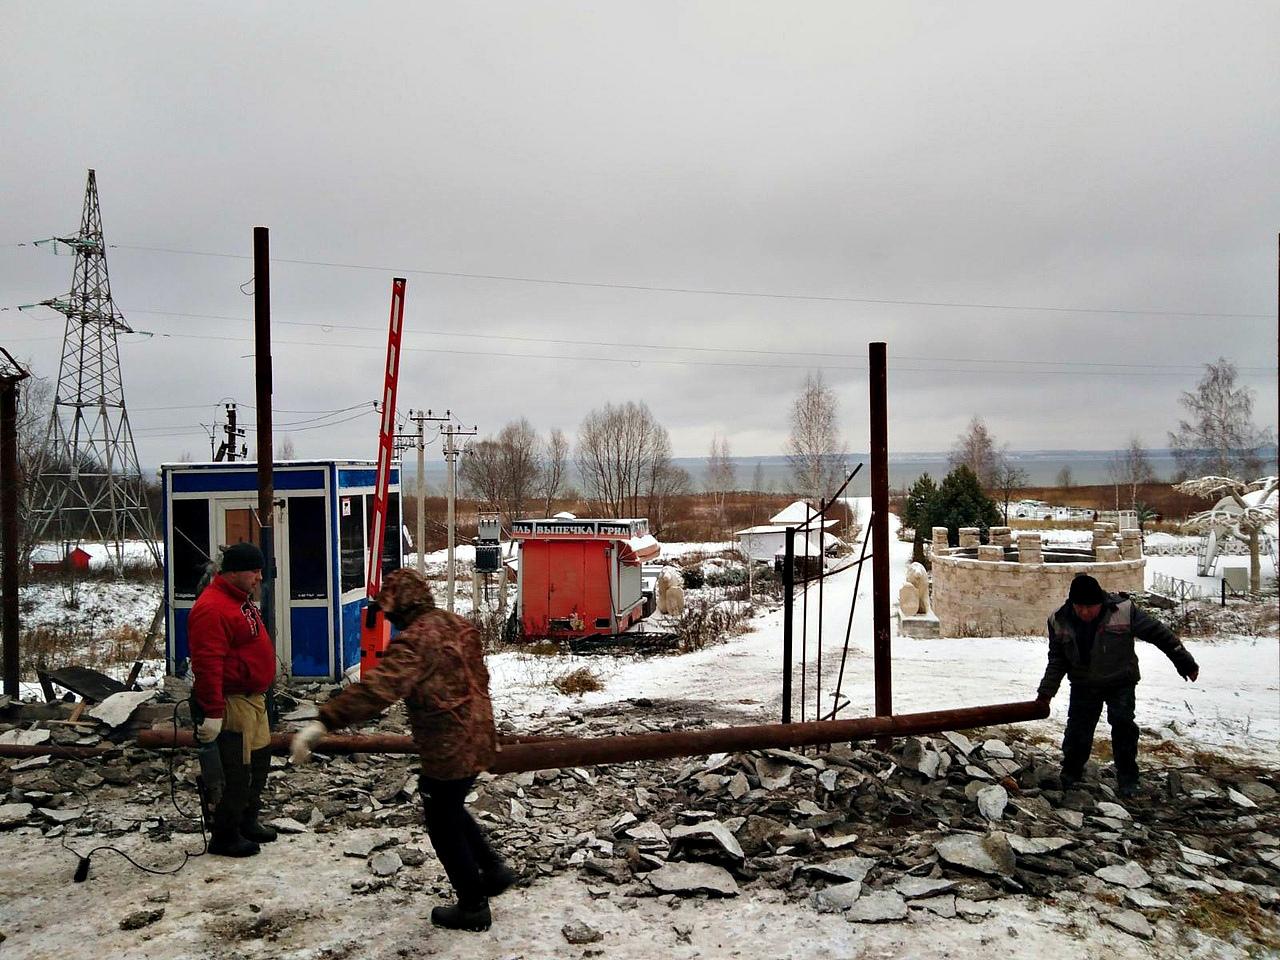 Ярославна незаконно открыла свое кафе на территории «Плещеева озера»